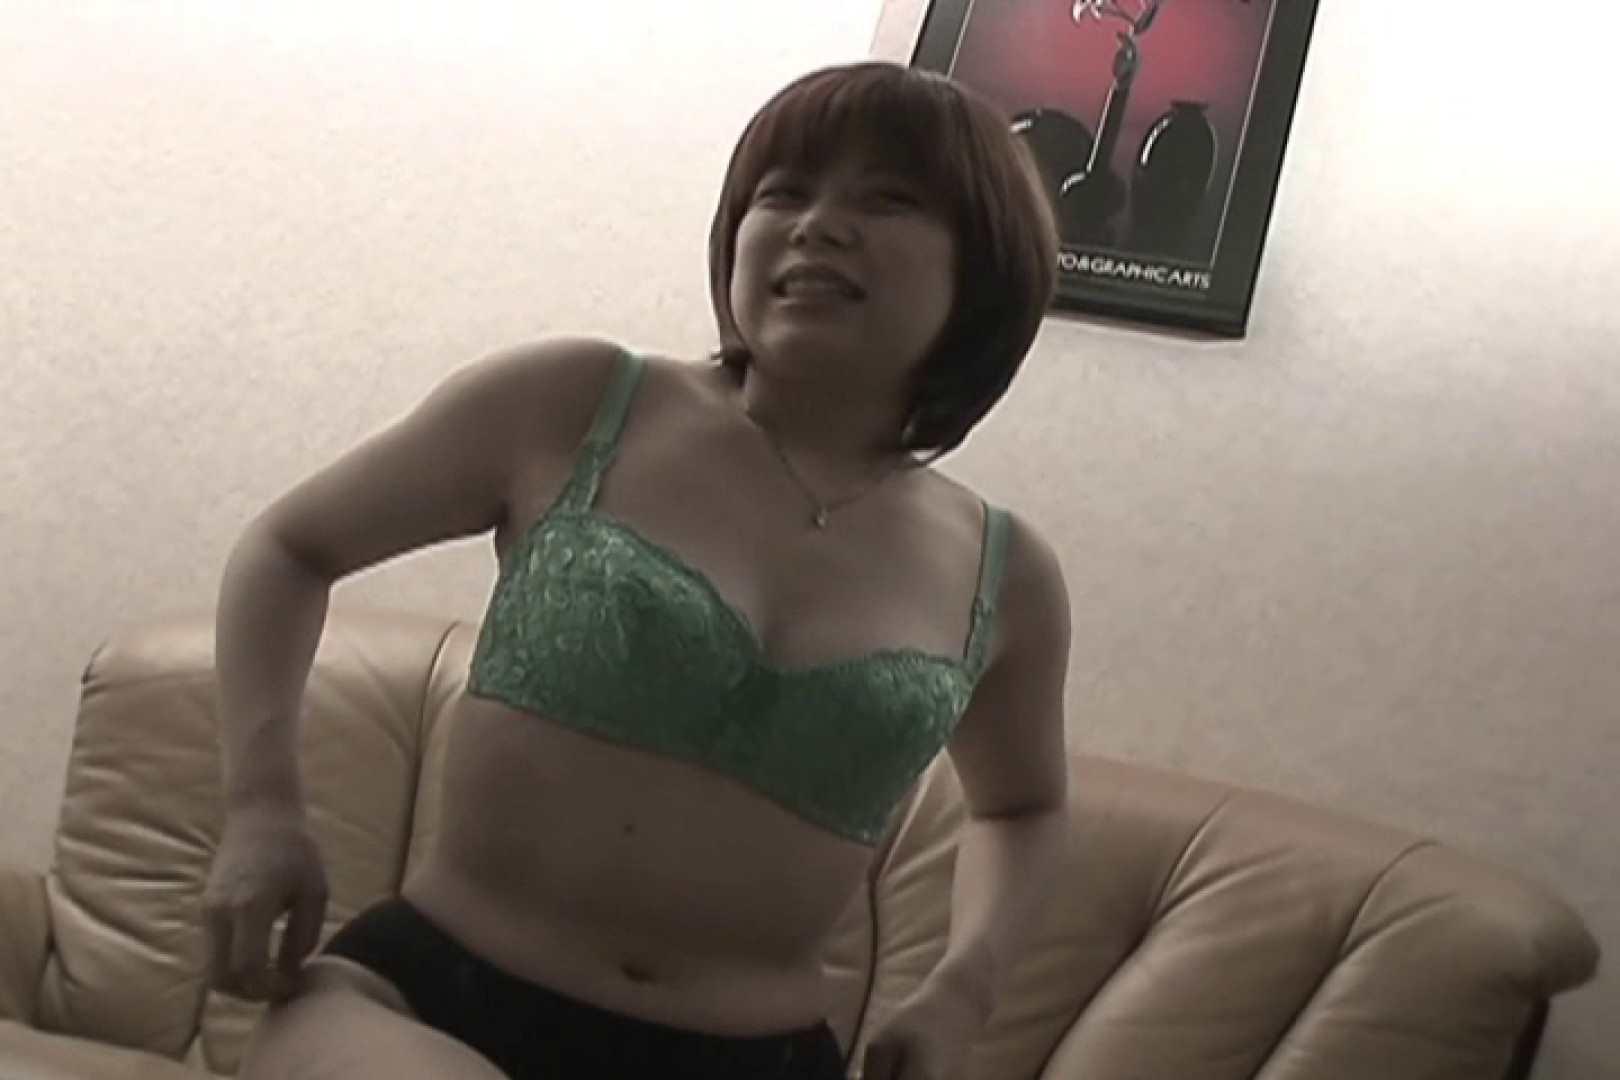 Hするために生まれてきたようなイキまくりの極エロ人妻~小池ゆり~ 熟女  108連発 58